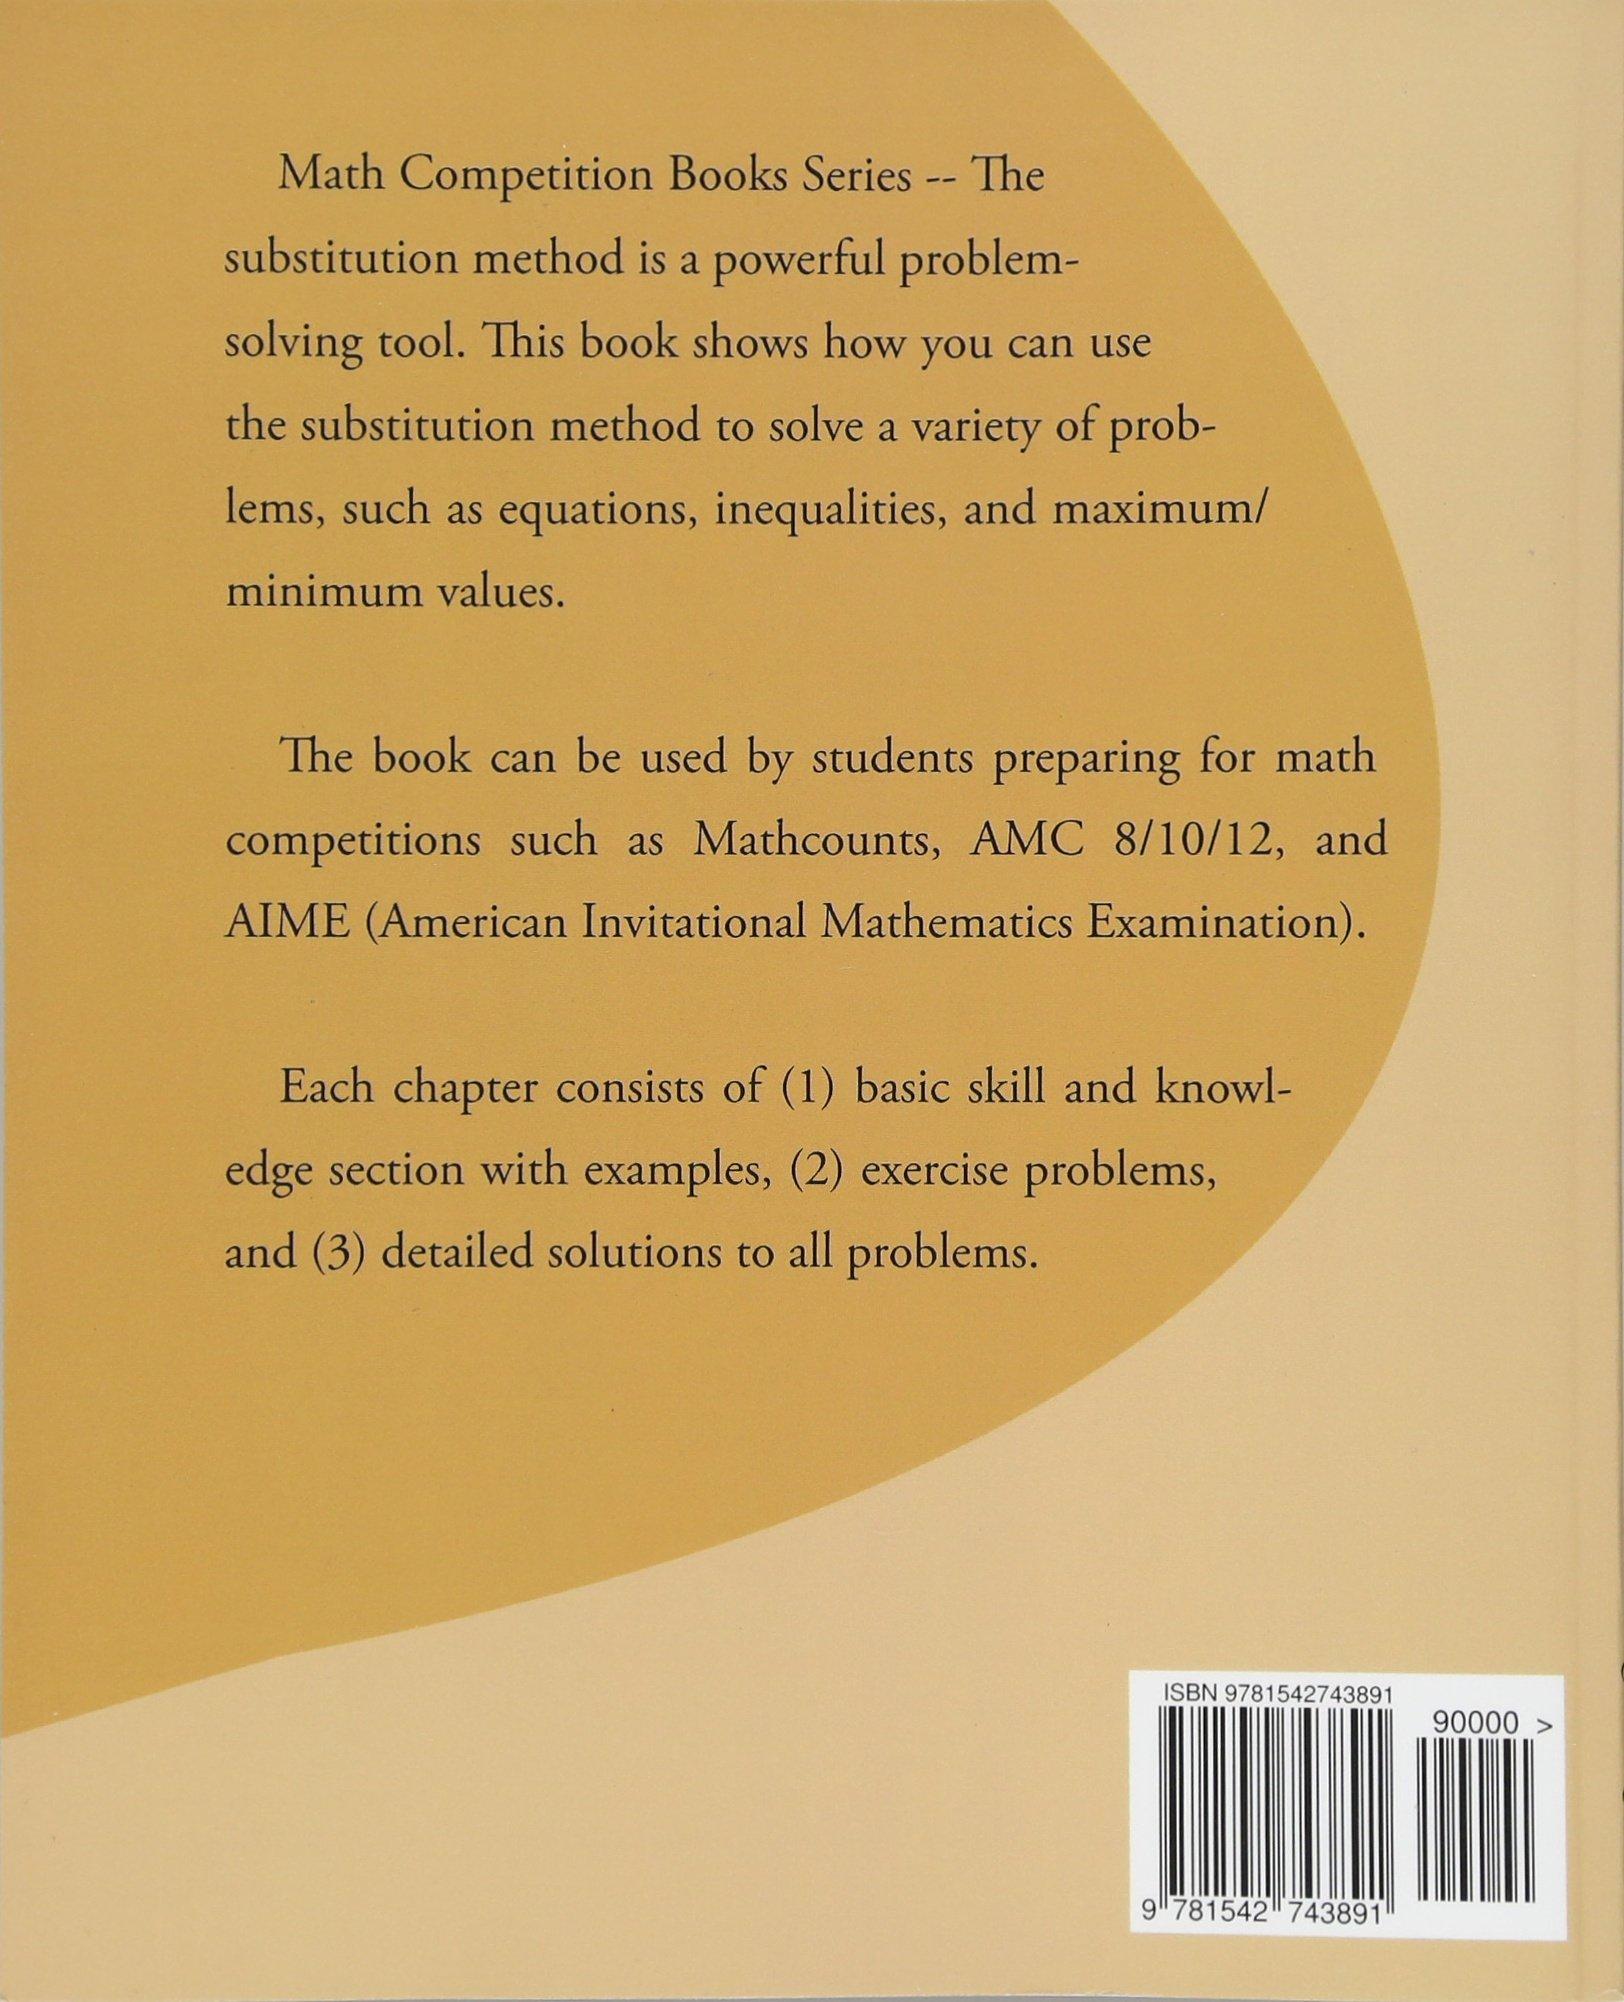 Amazon com: The Substitution Method (9781542743891